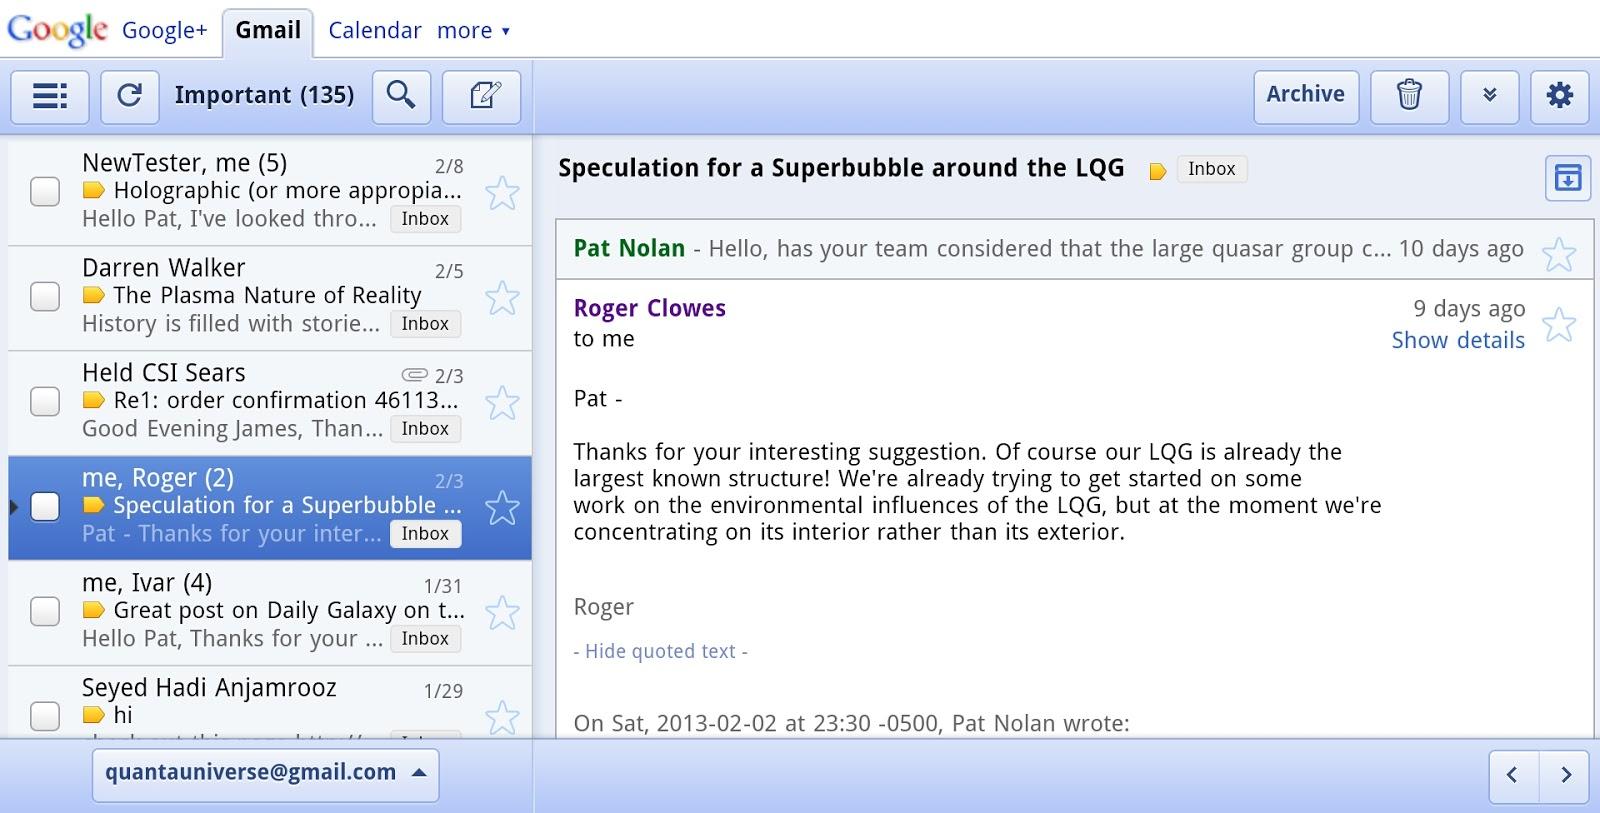 Electrical Charged Superfluid Plasma Cosmology January 2013